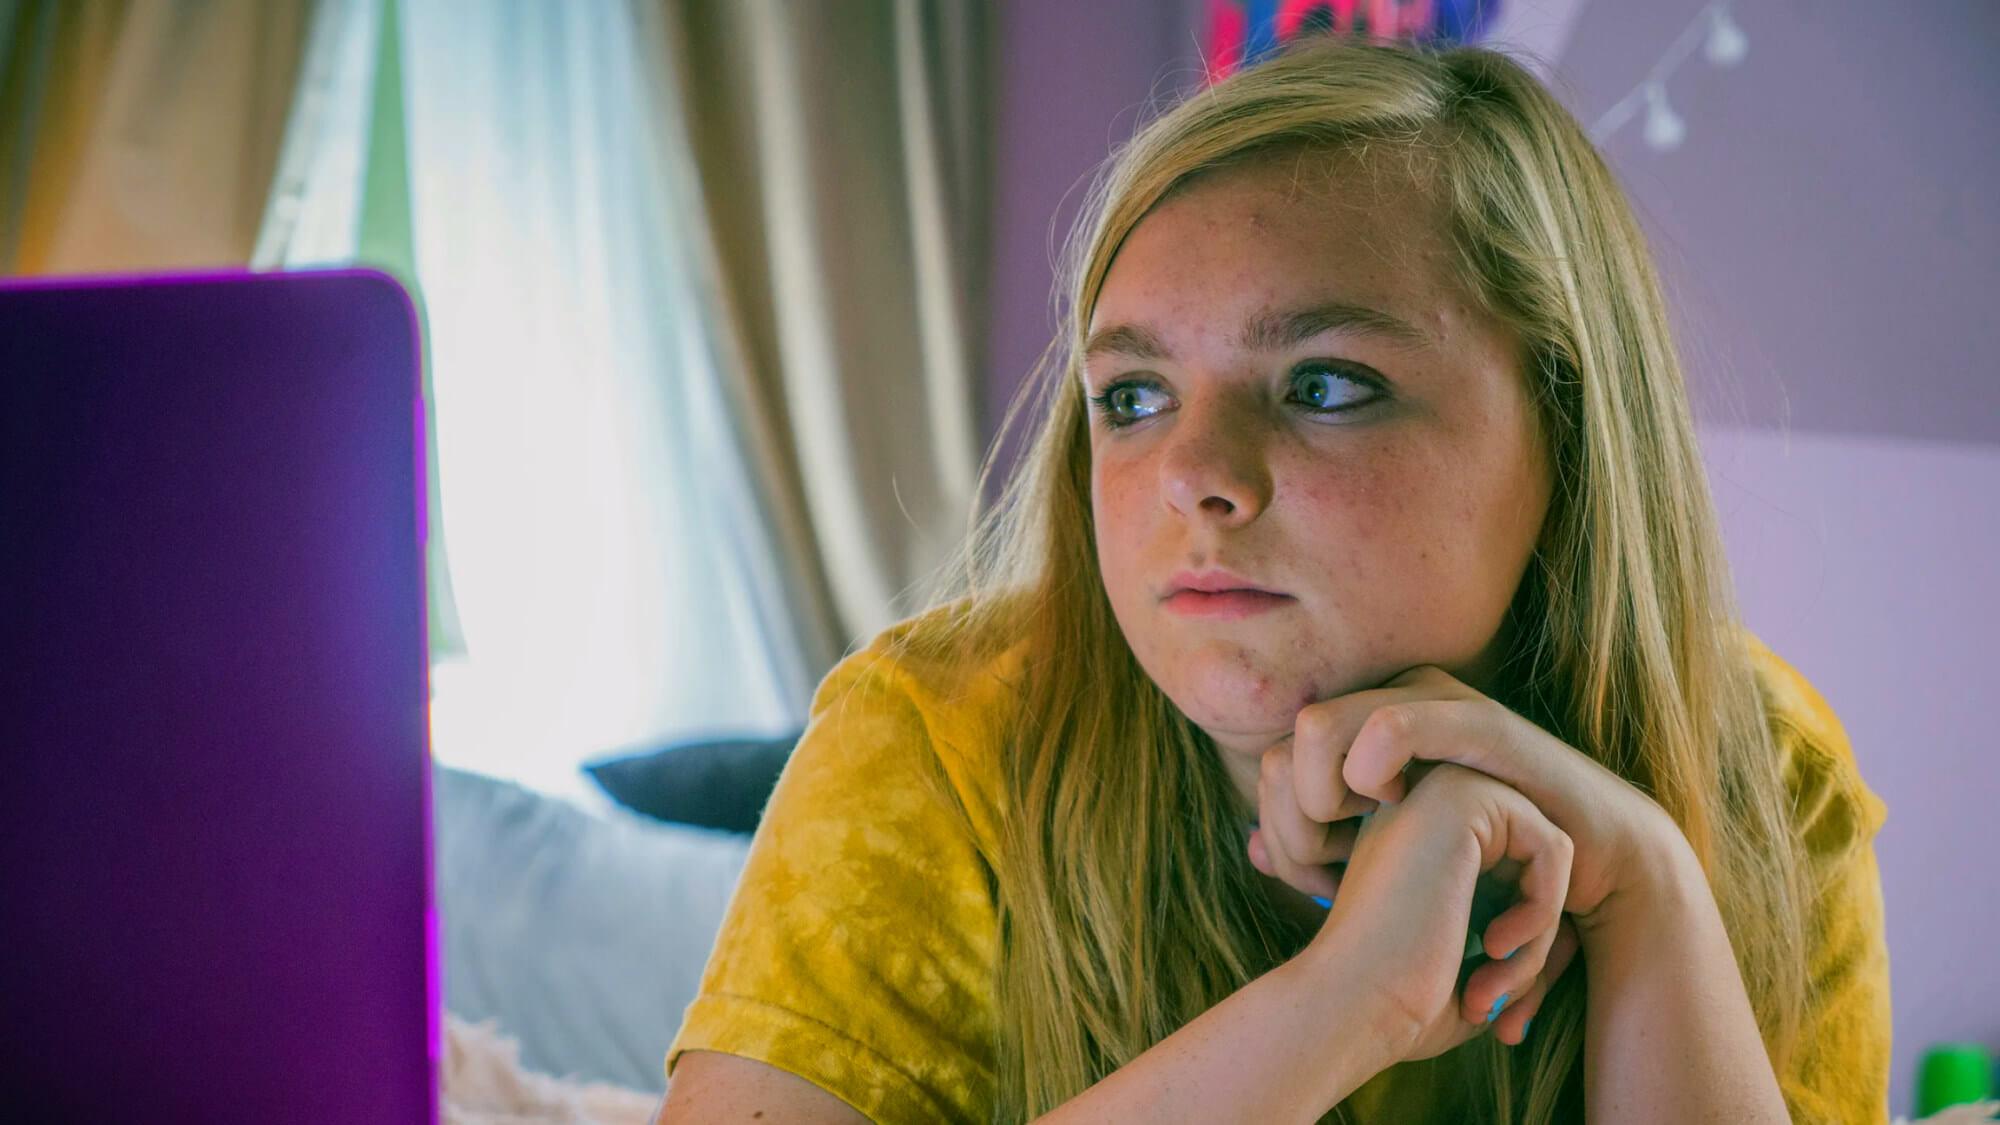 Kayla (Elsie Fisher) in Eighth Grade